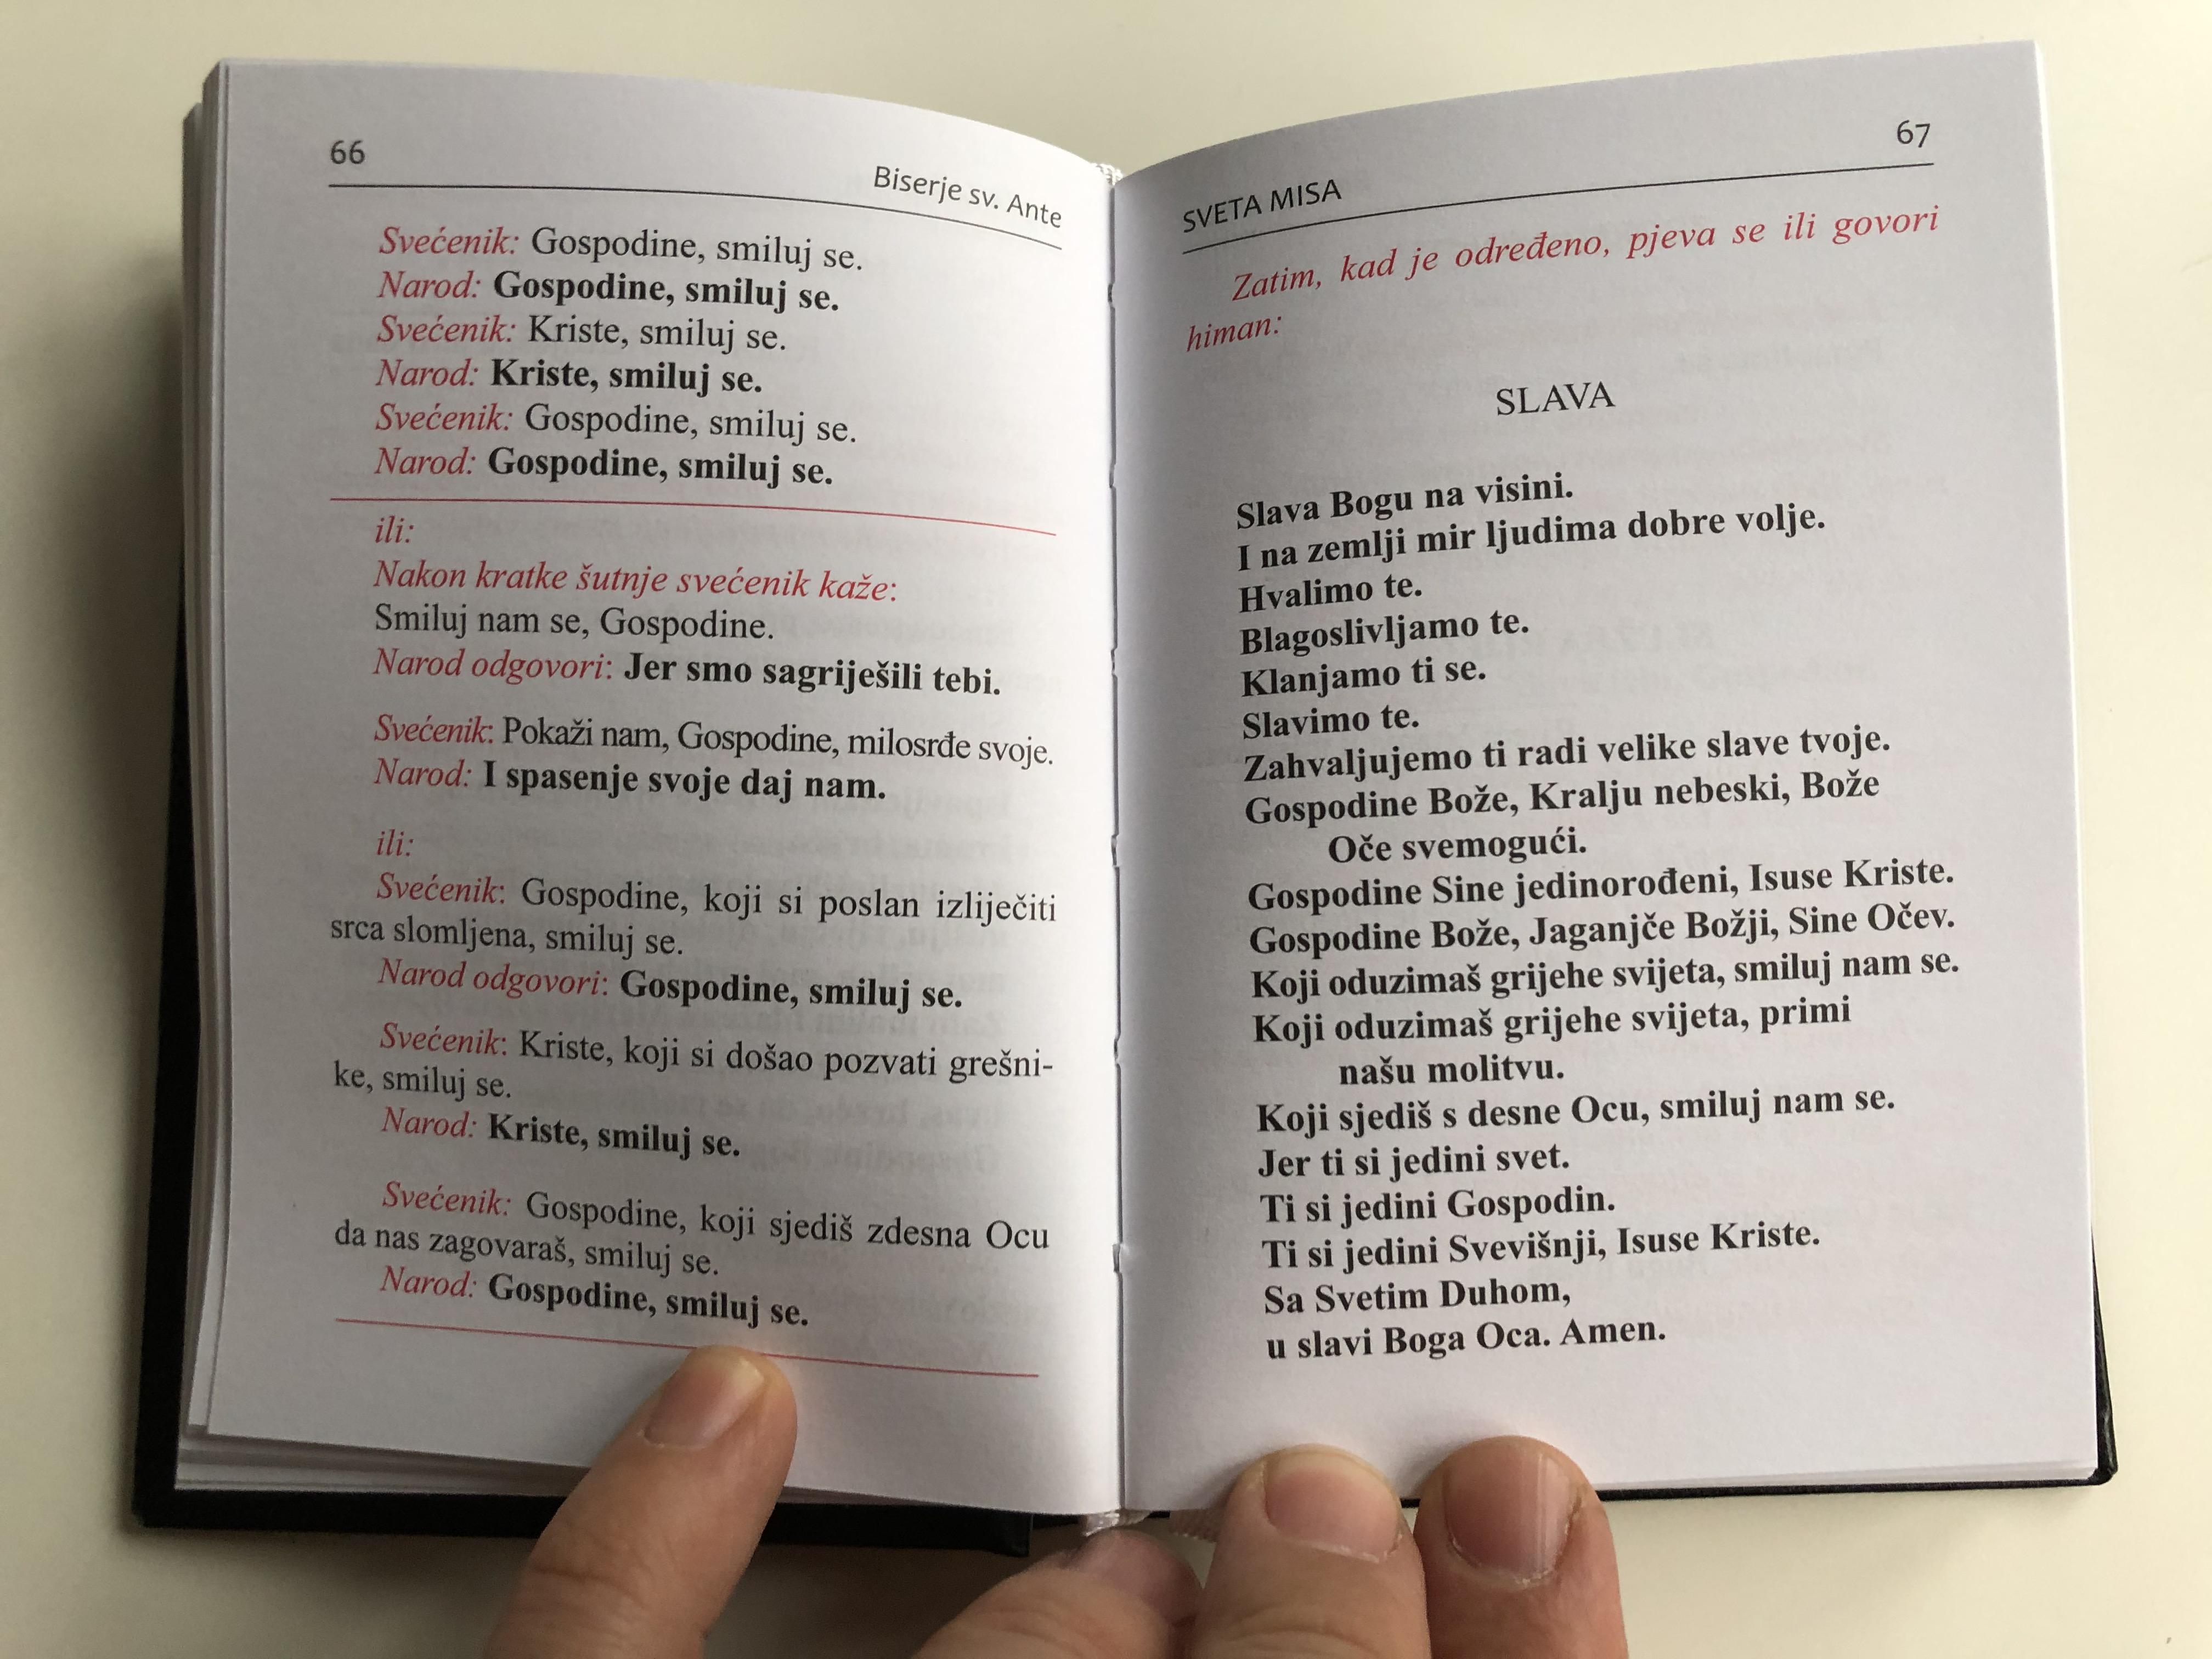 biserje-svetog-ante-pearls-of-st.-anthony-of-padua-croatian-language-catholic-prayerbook-7.jpg